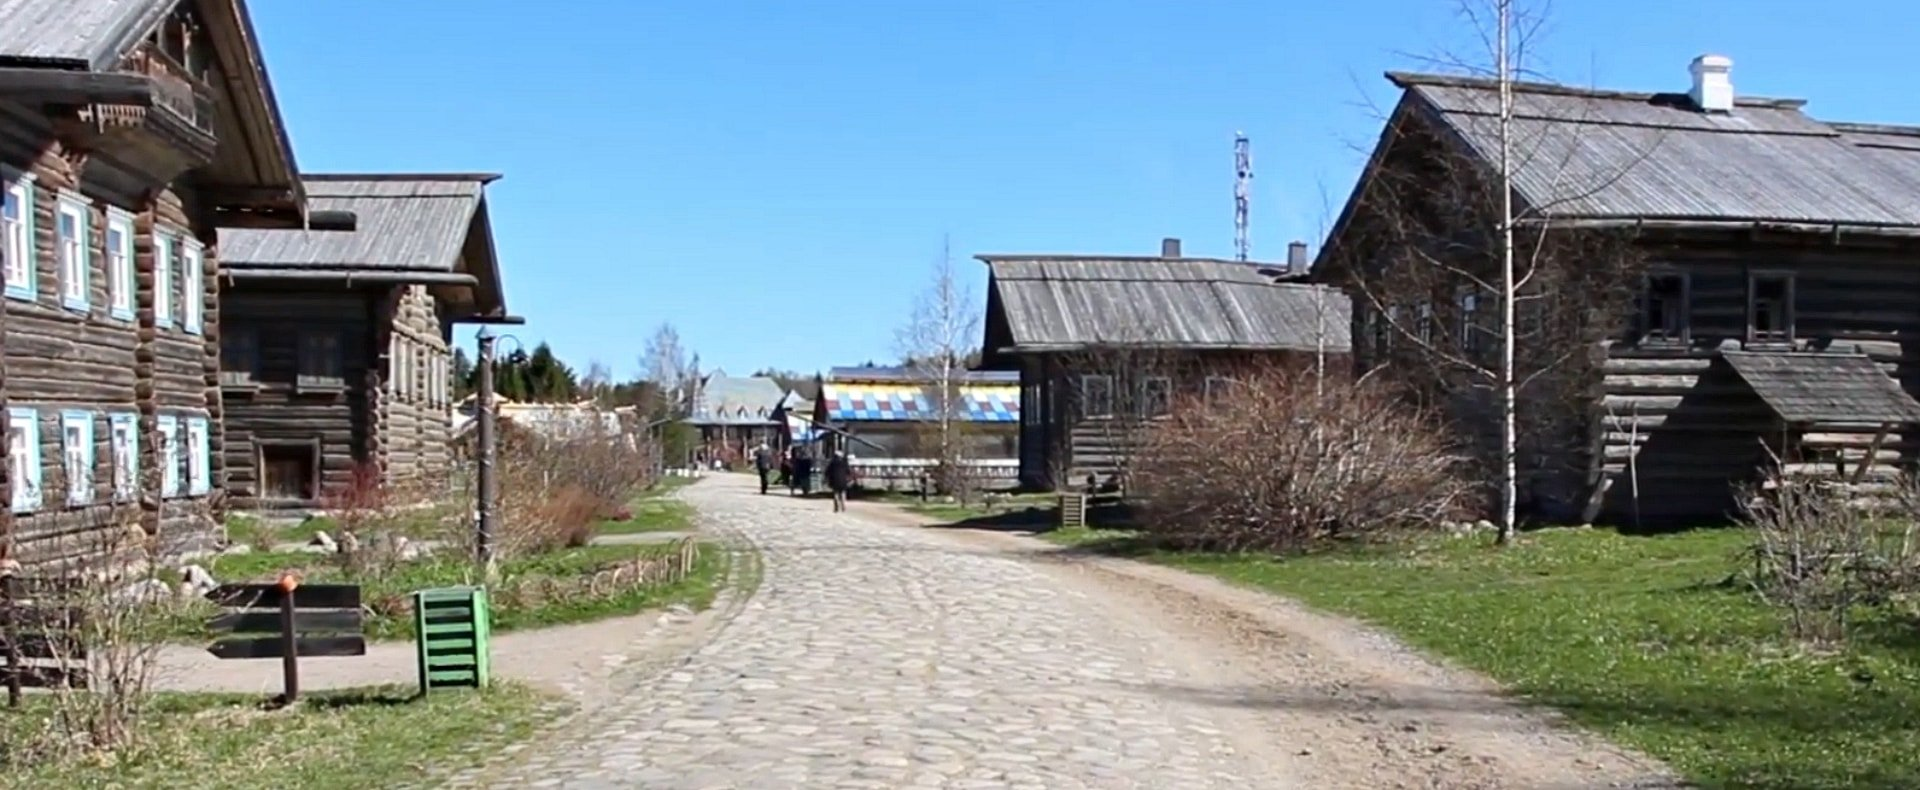 Mandrogi, Russia